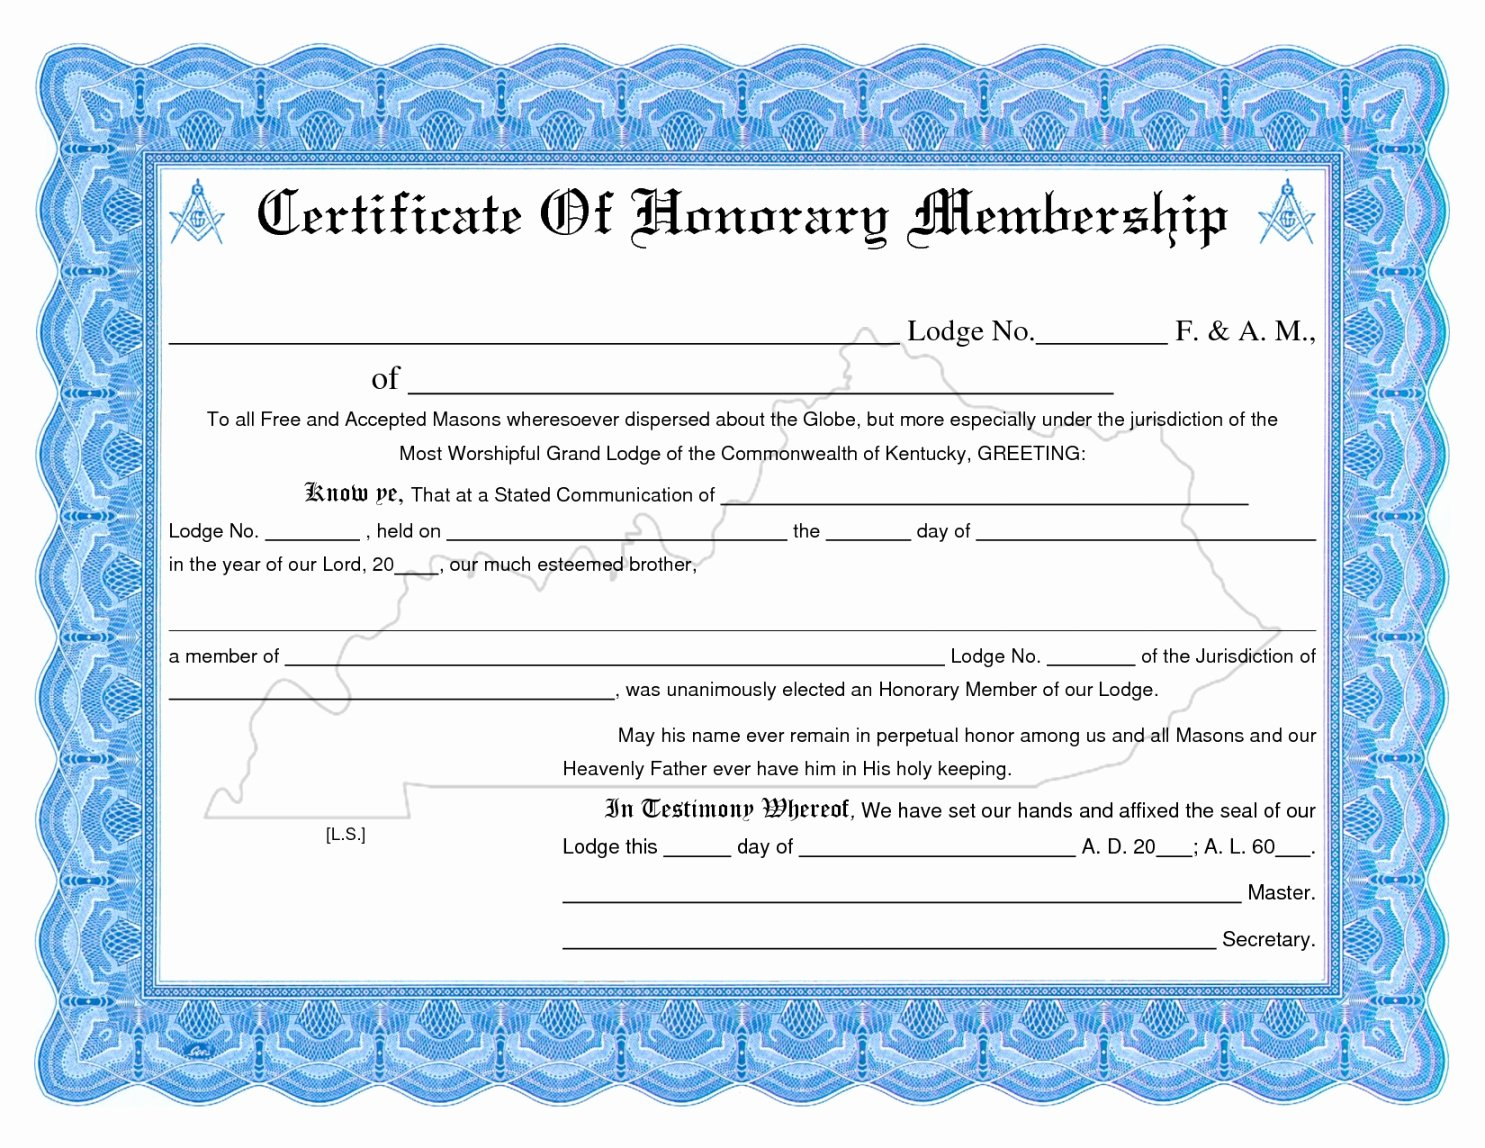 Llc Membership Certificate Template Awesome Editable Membership Certificate Template Llc New Church